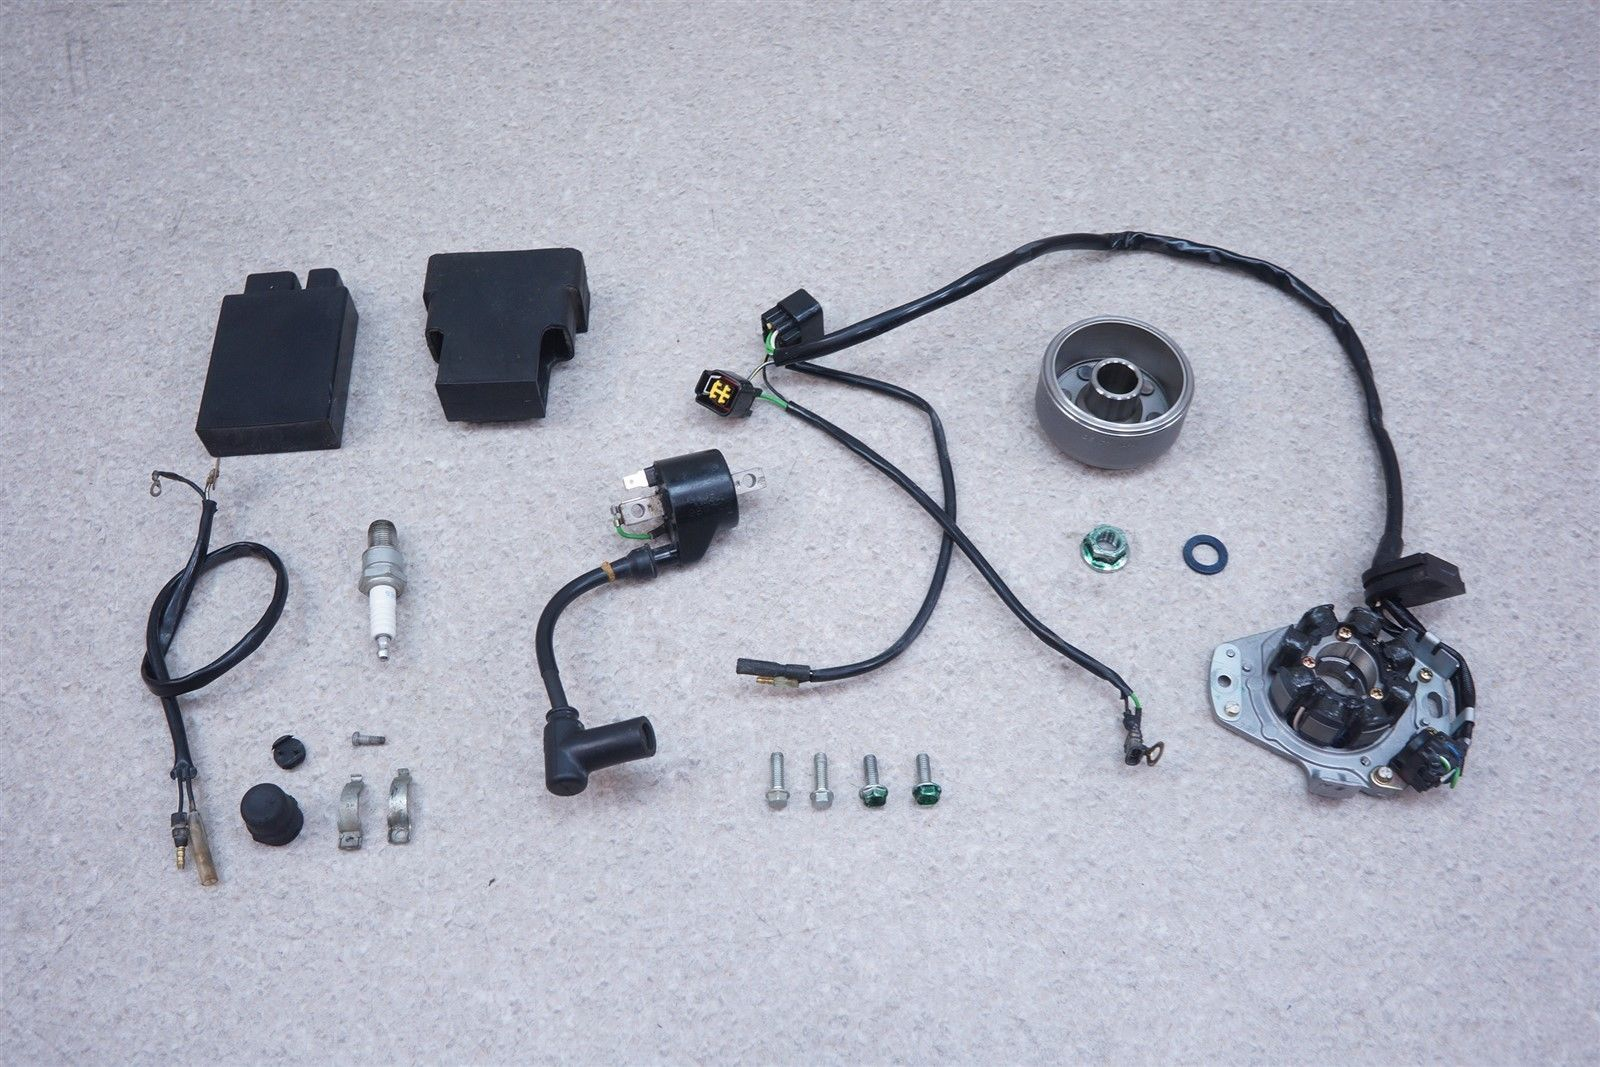 Ultima Complete Wiring Harness Kit For Harley Davidson